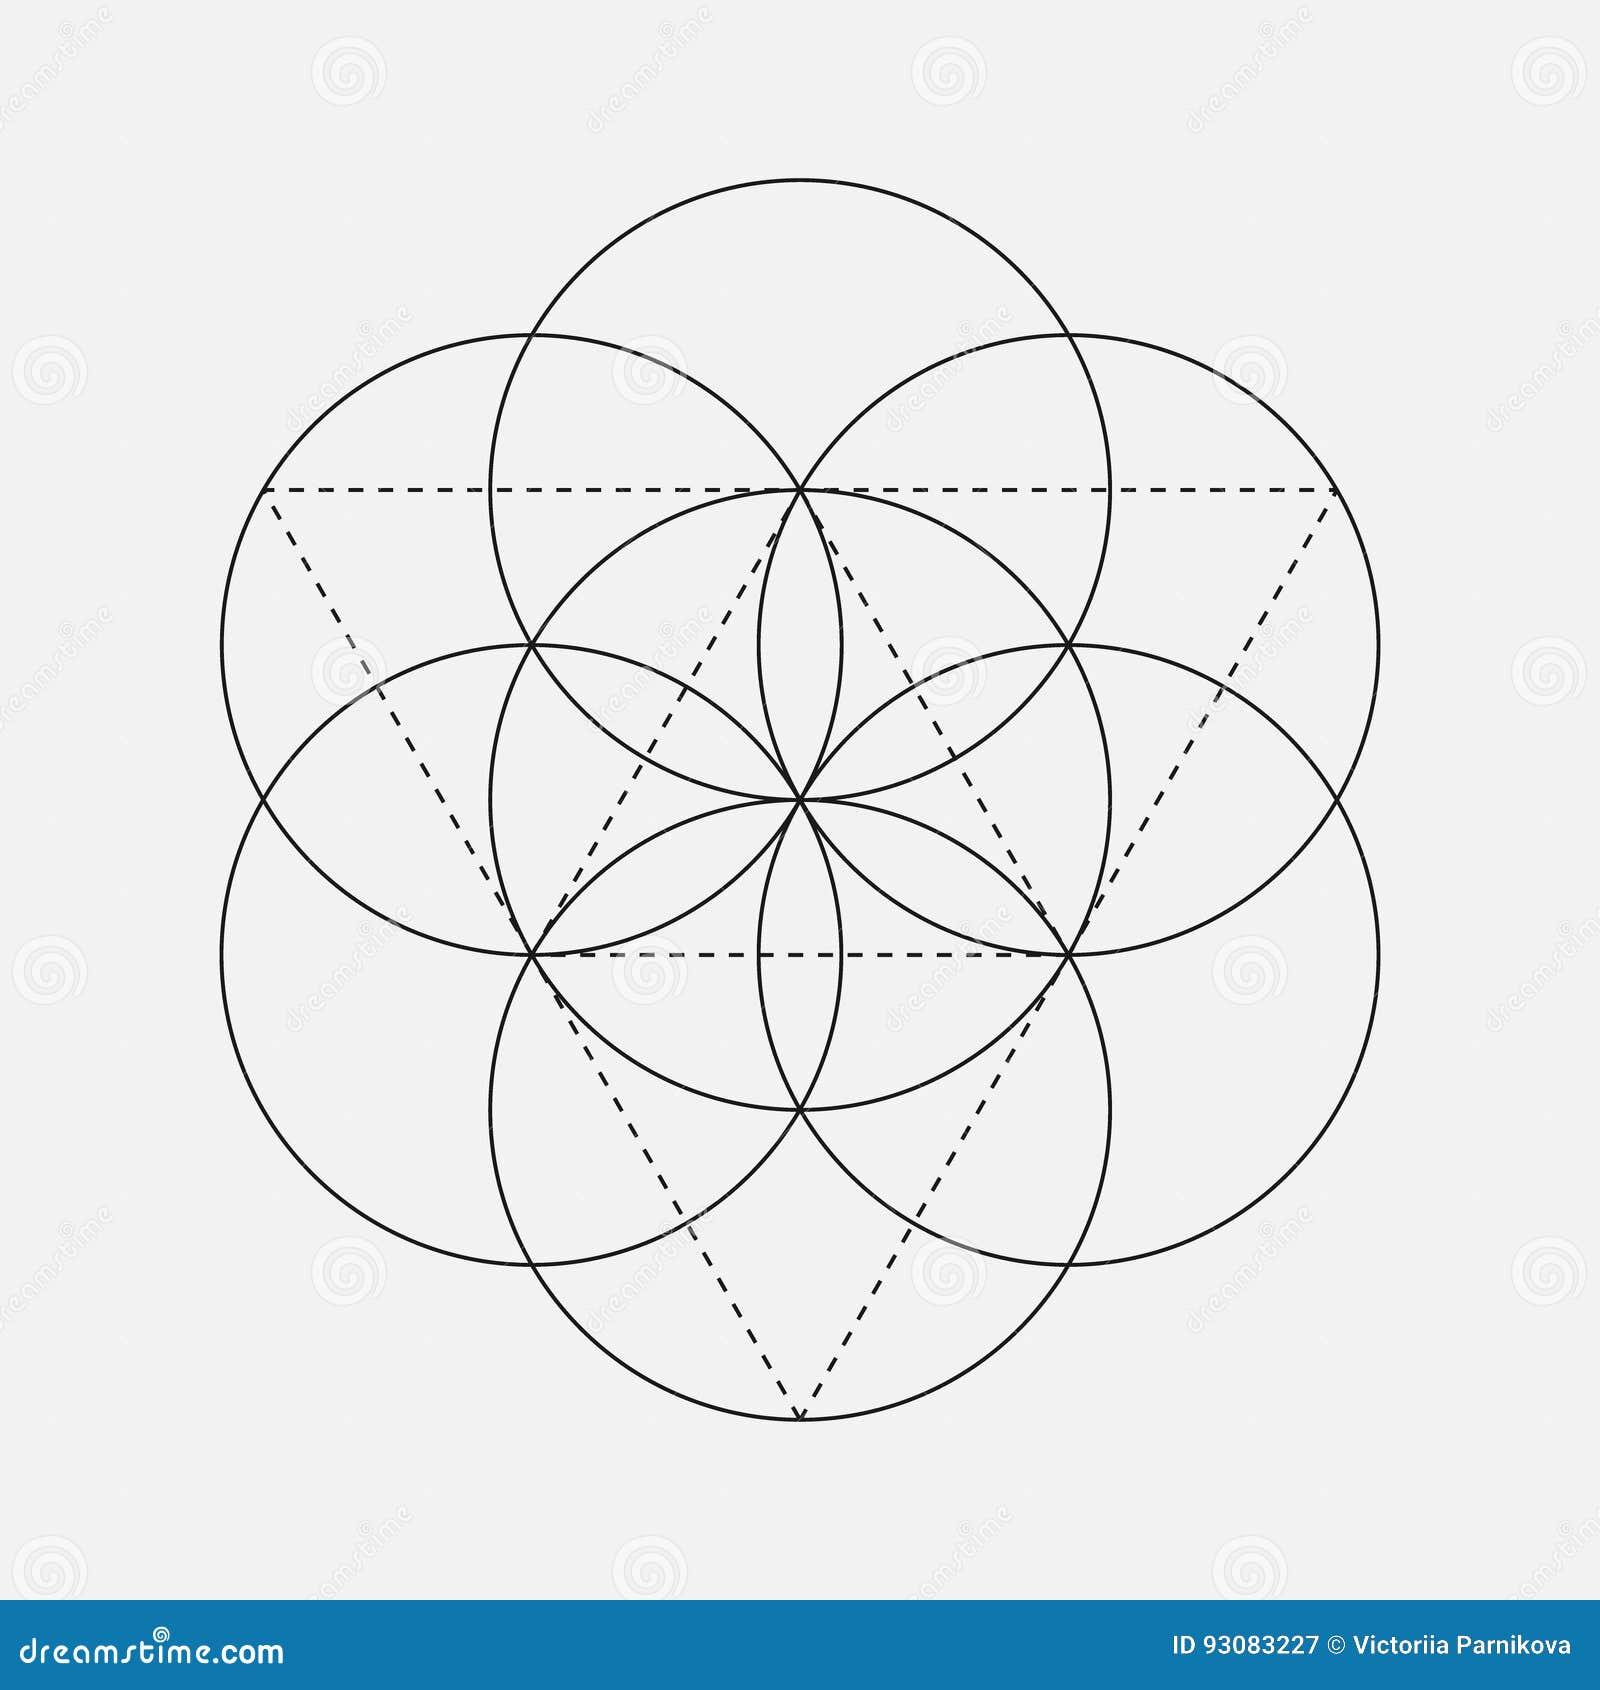 flower of life sign geometric symbol stock vector illustration of